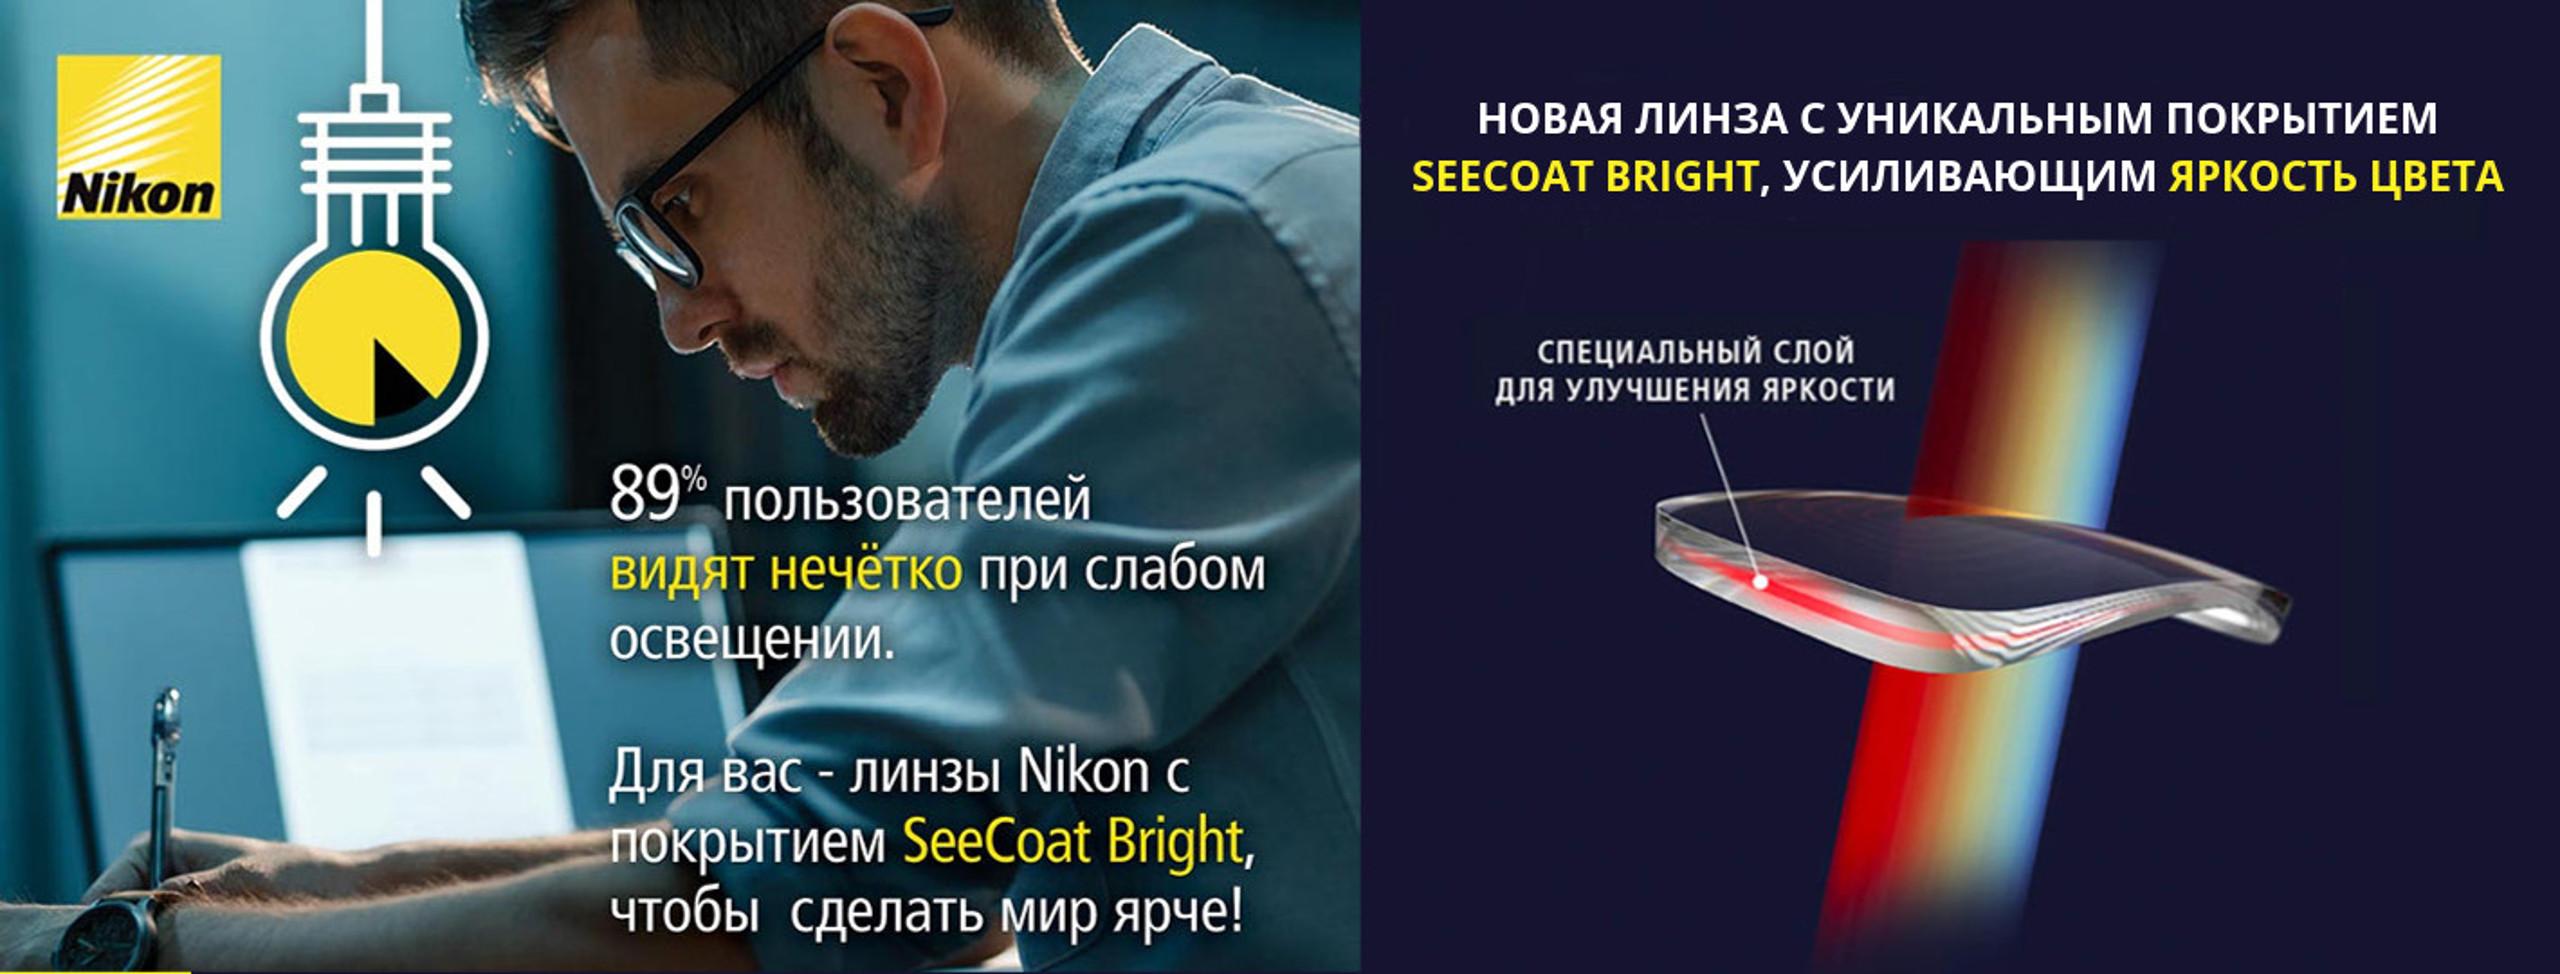 http://familyoptica.ru/images/seecoat-bright1.jpg